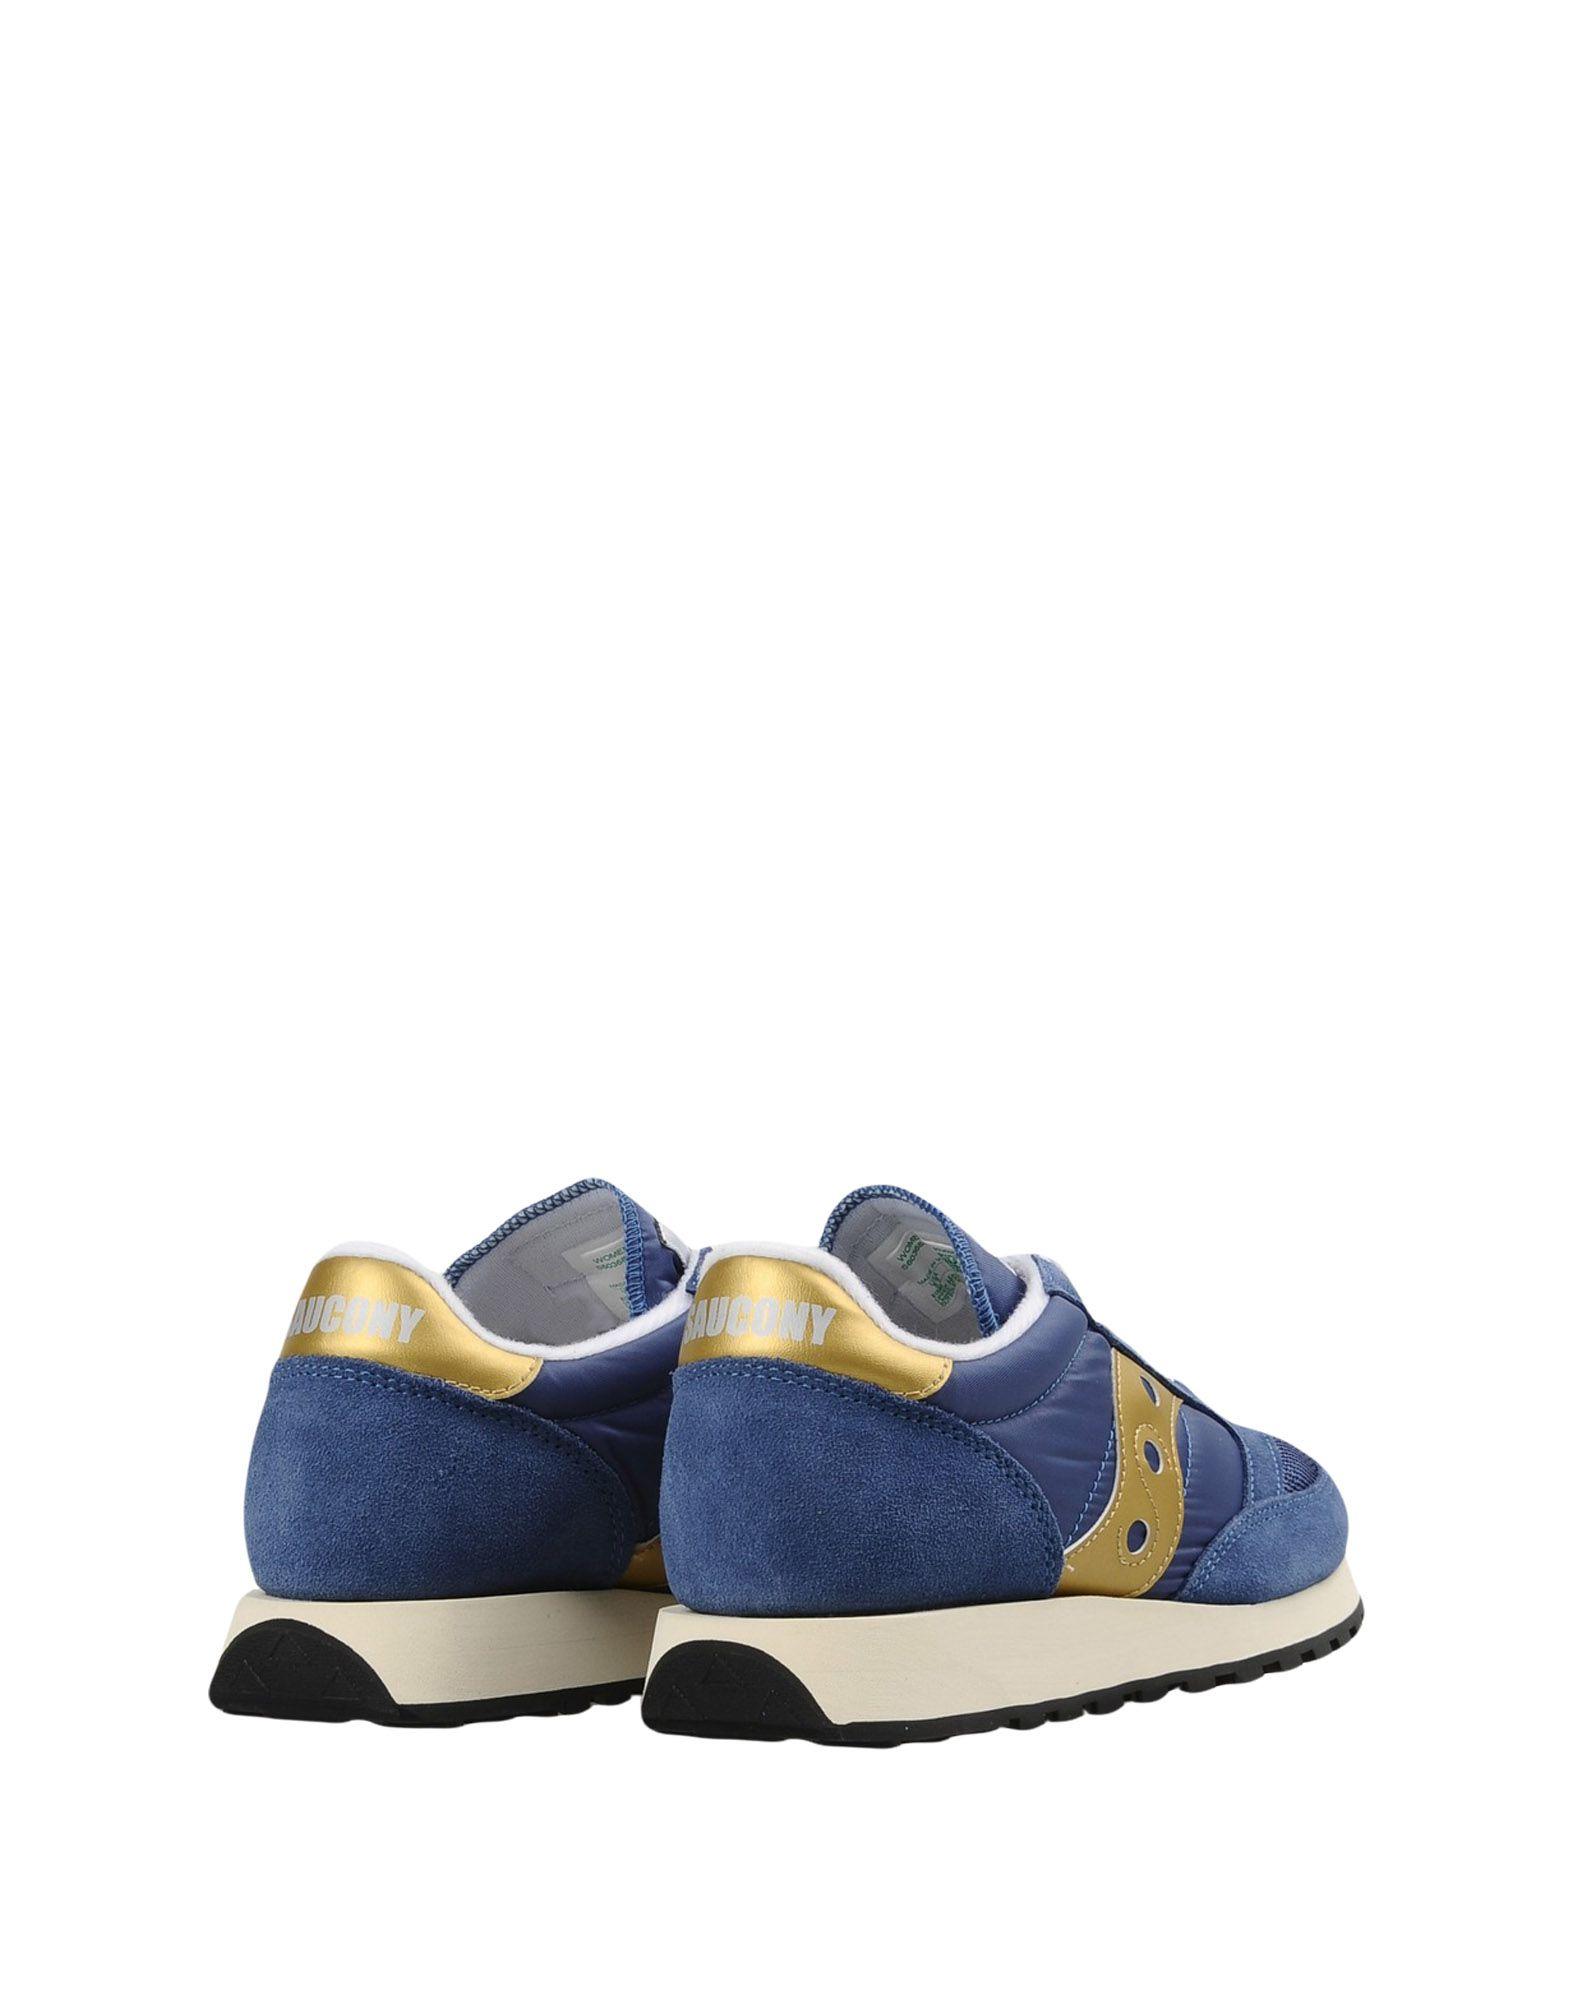 Sneakers Saucony Jazz O Vintage - Femme - Sneakers Saucony sur